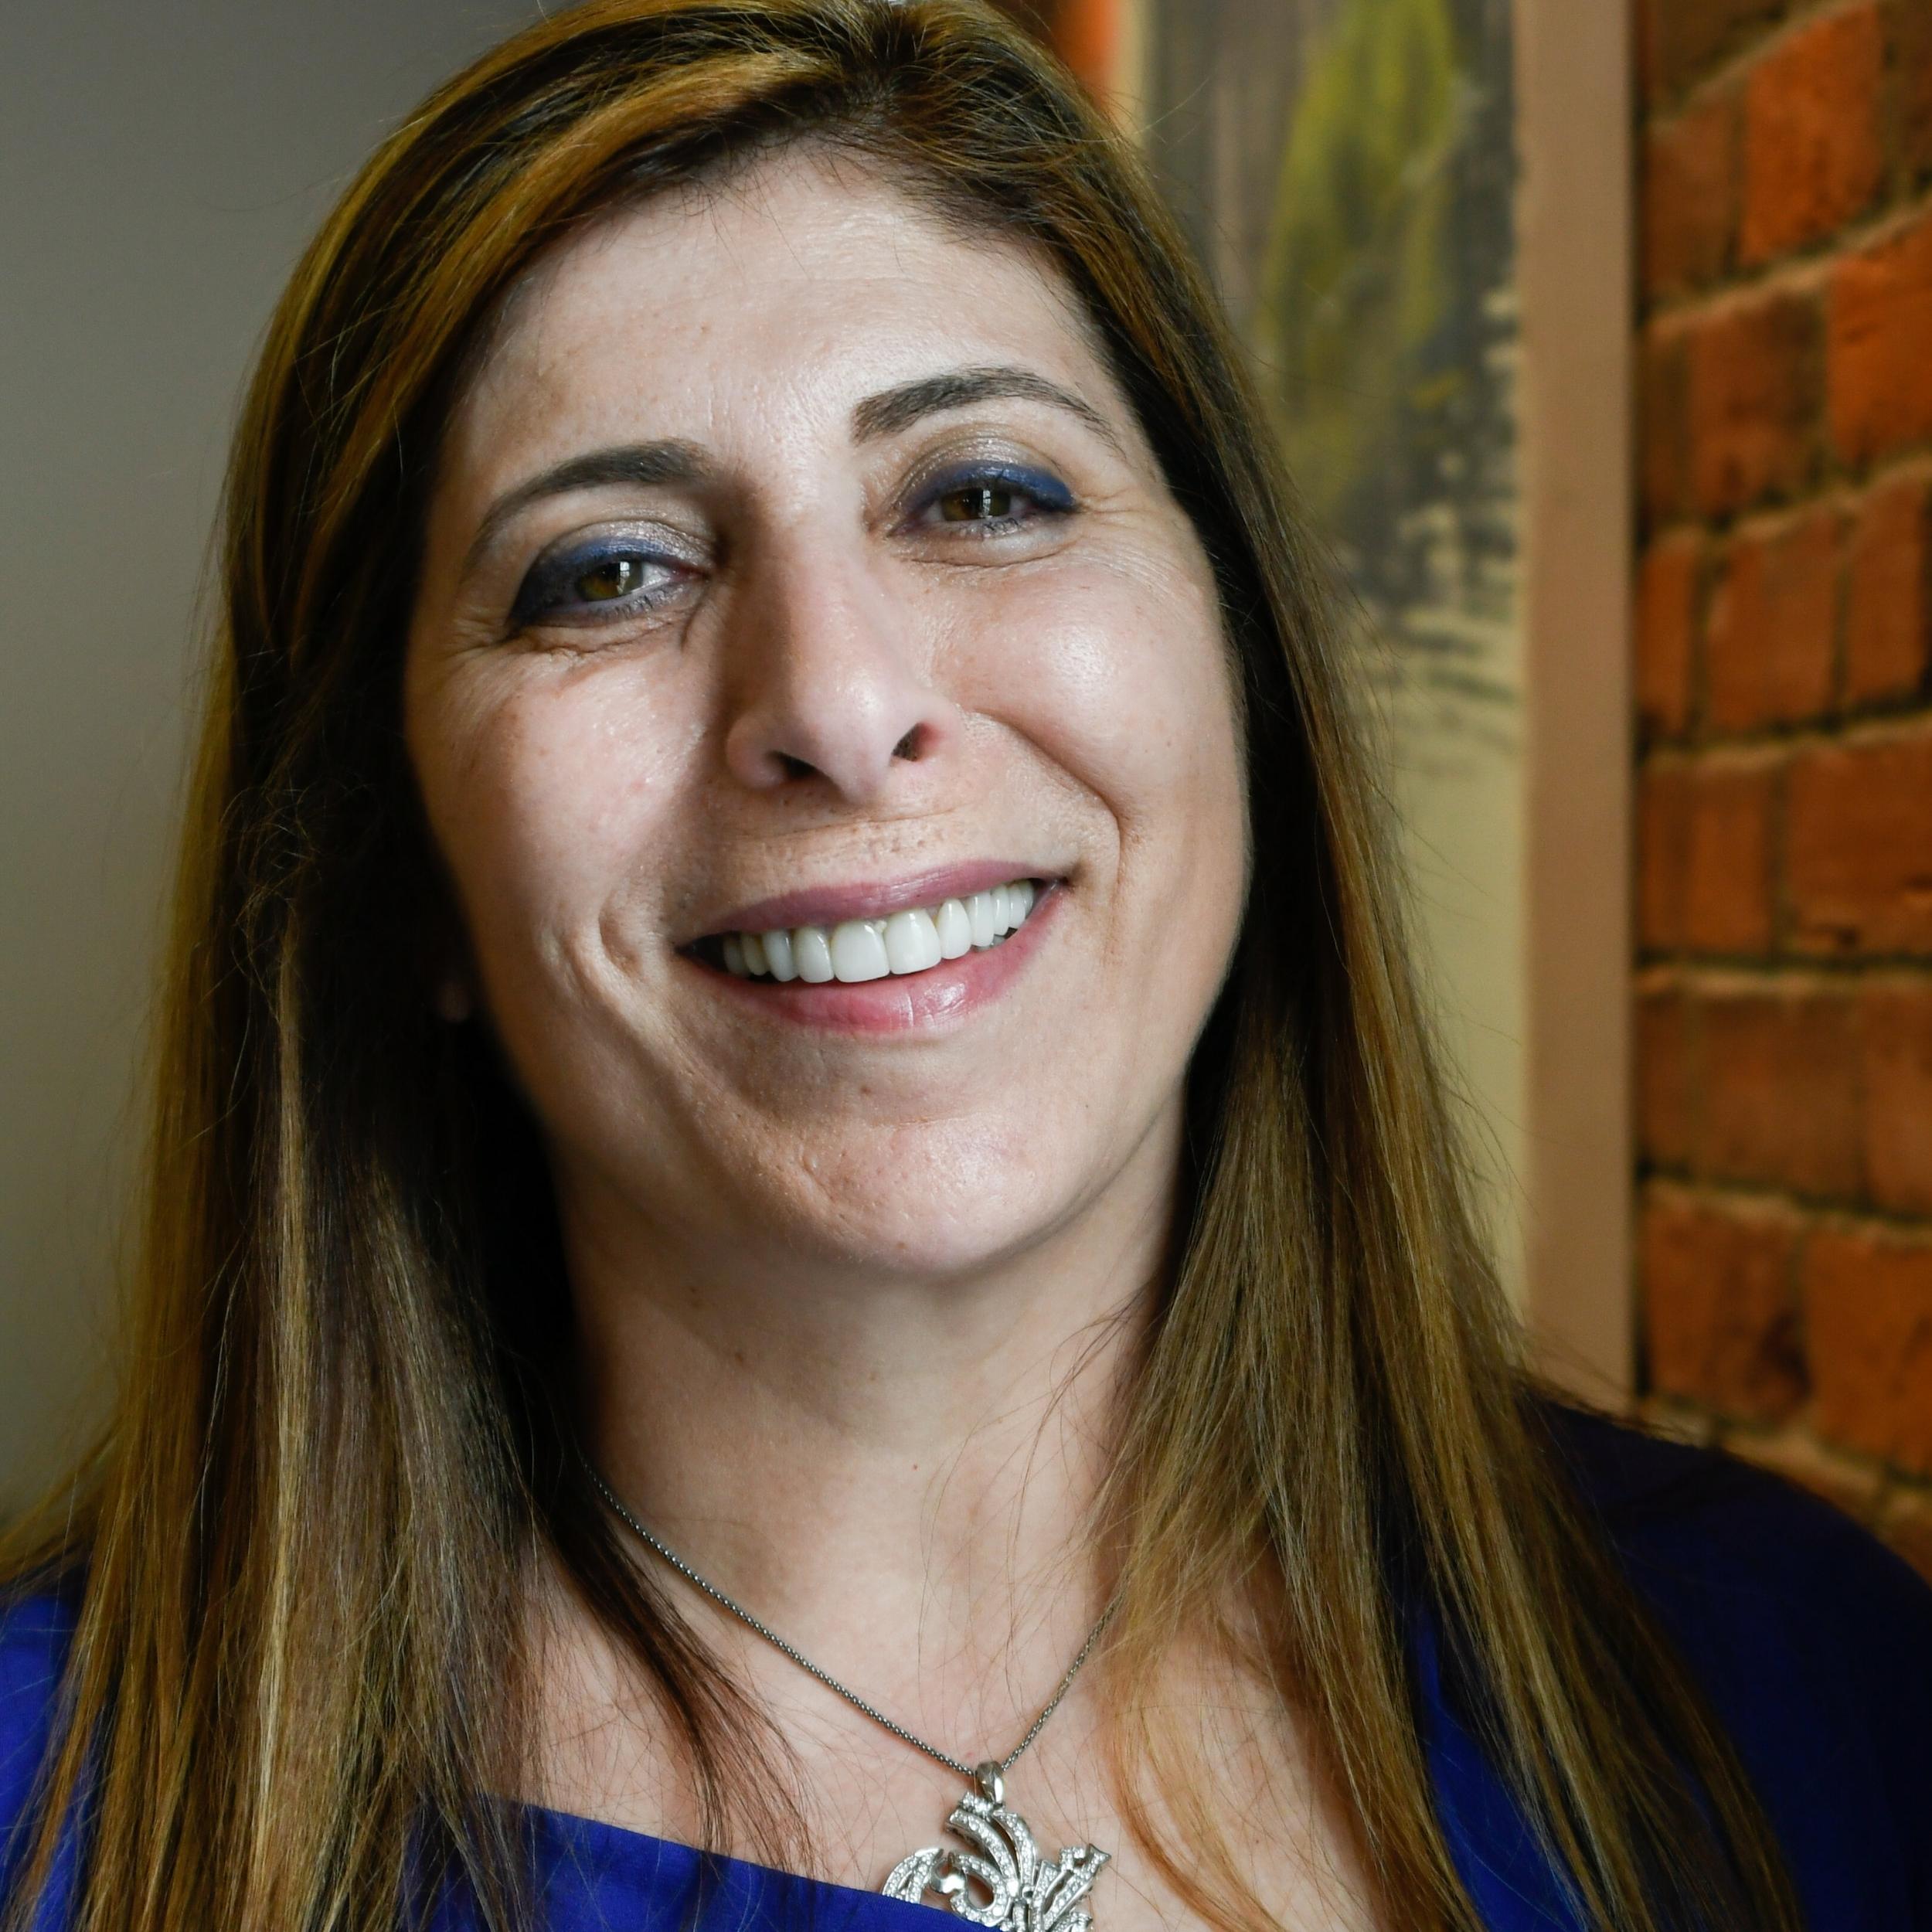 Zoe Sahloul, Exective Director at  NEAAO - New England Arab American Organization